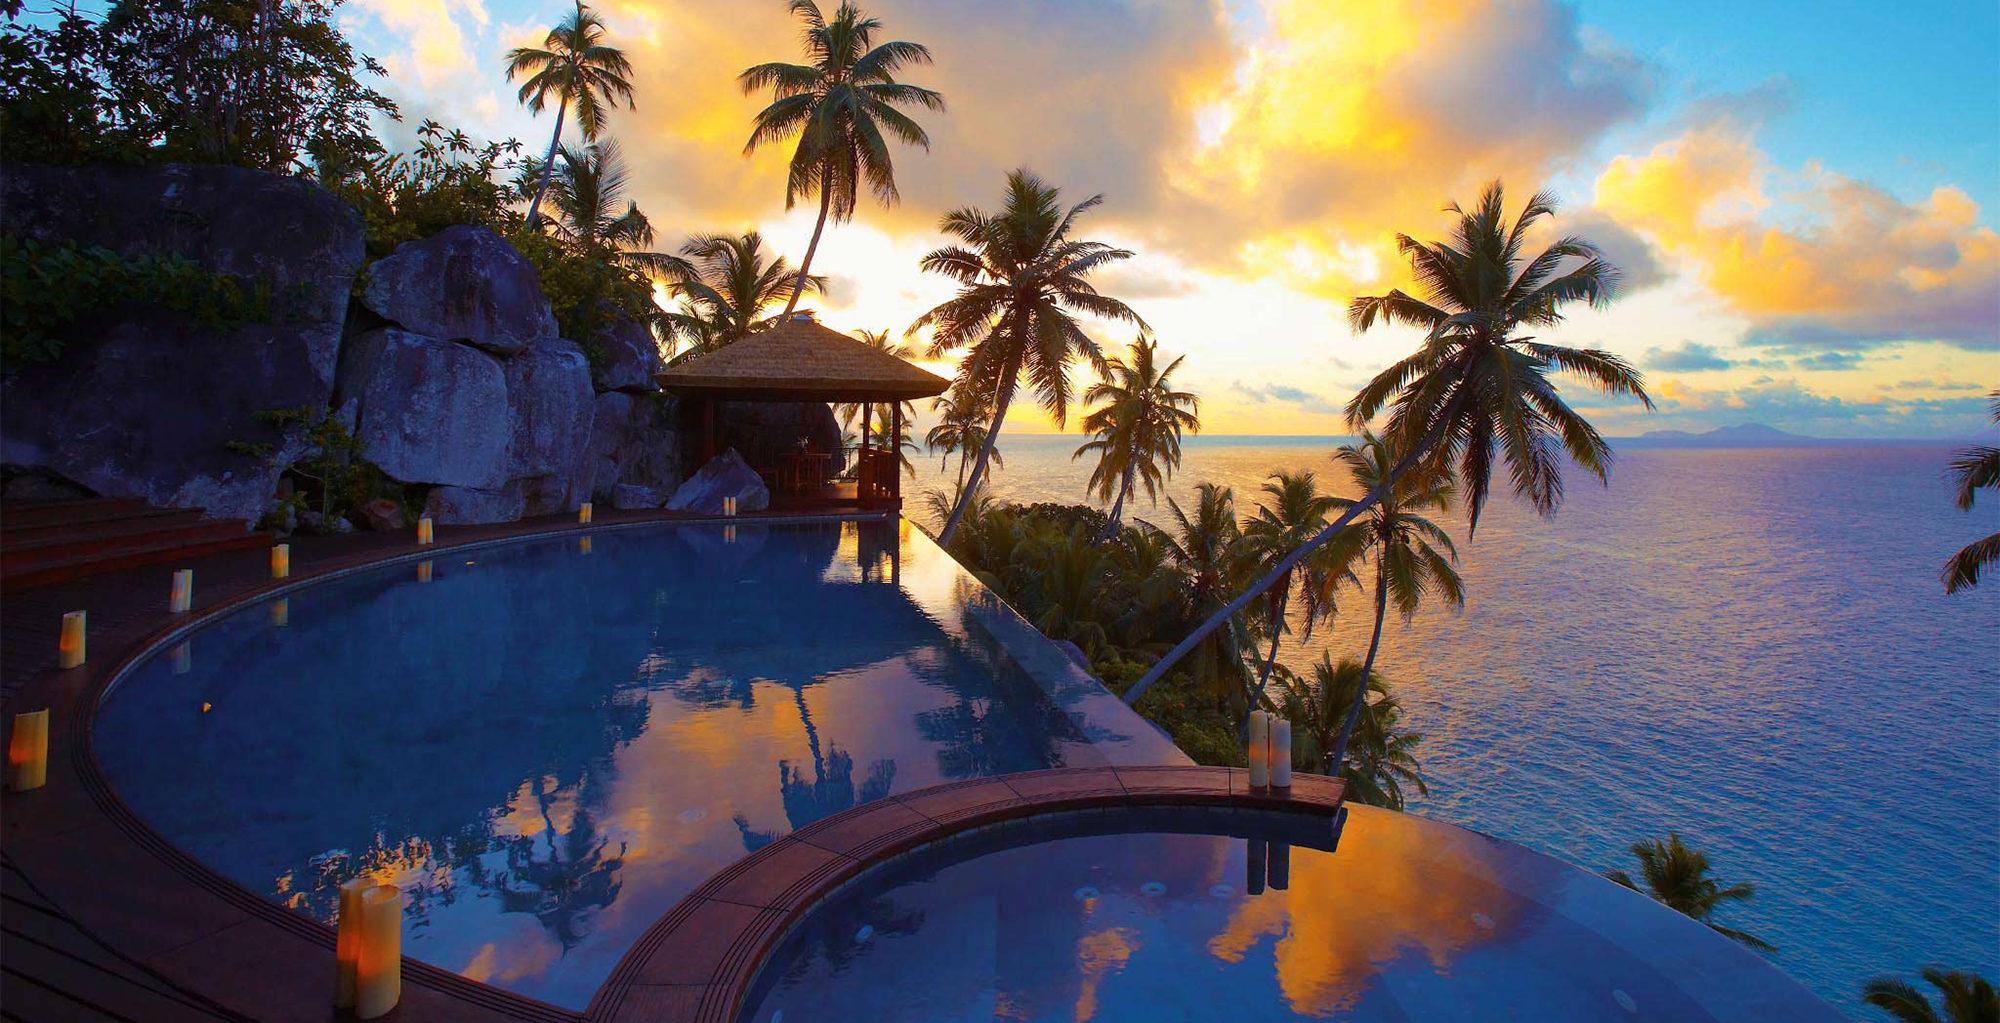 Seychelles-Fregate-Island-Swimming-Pool